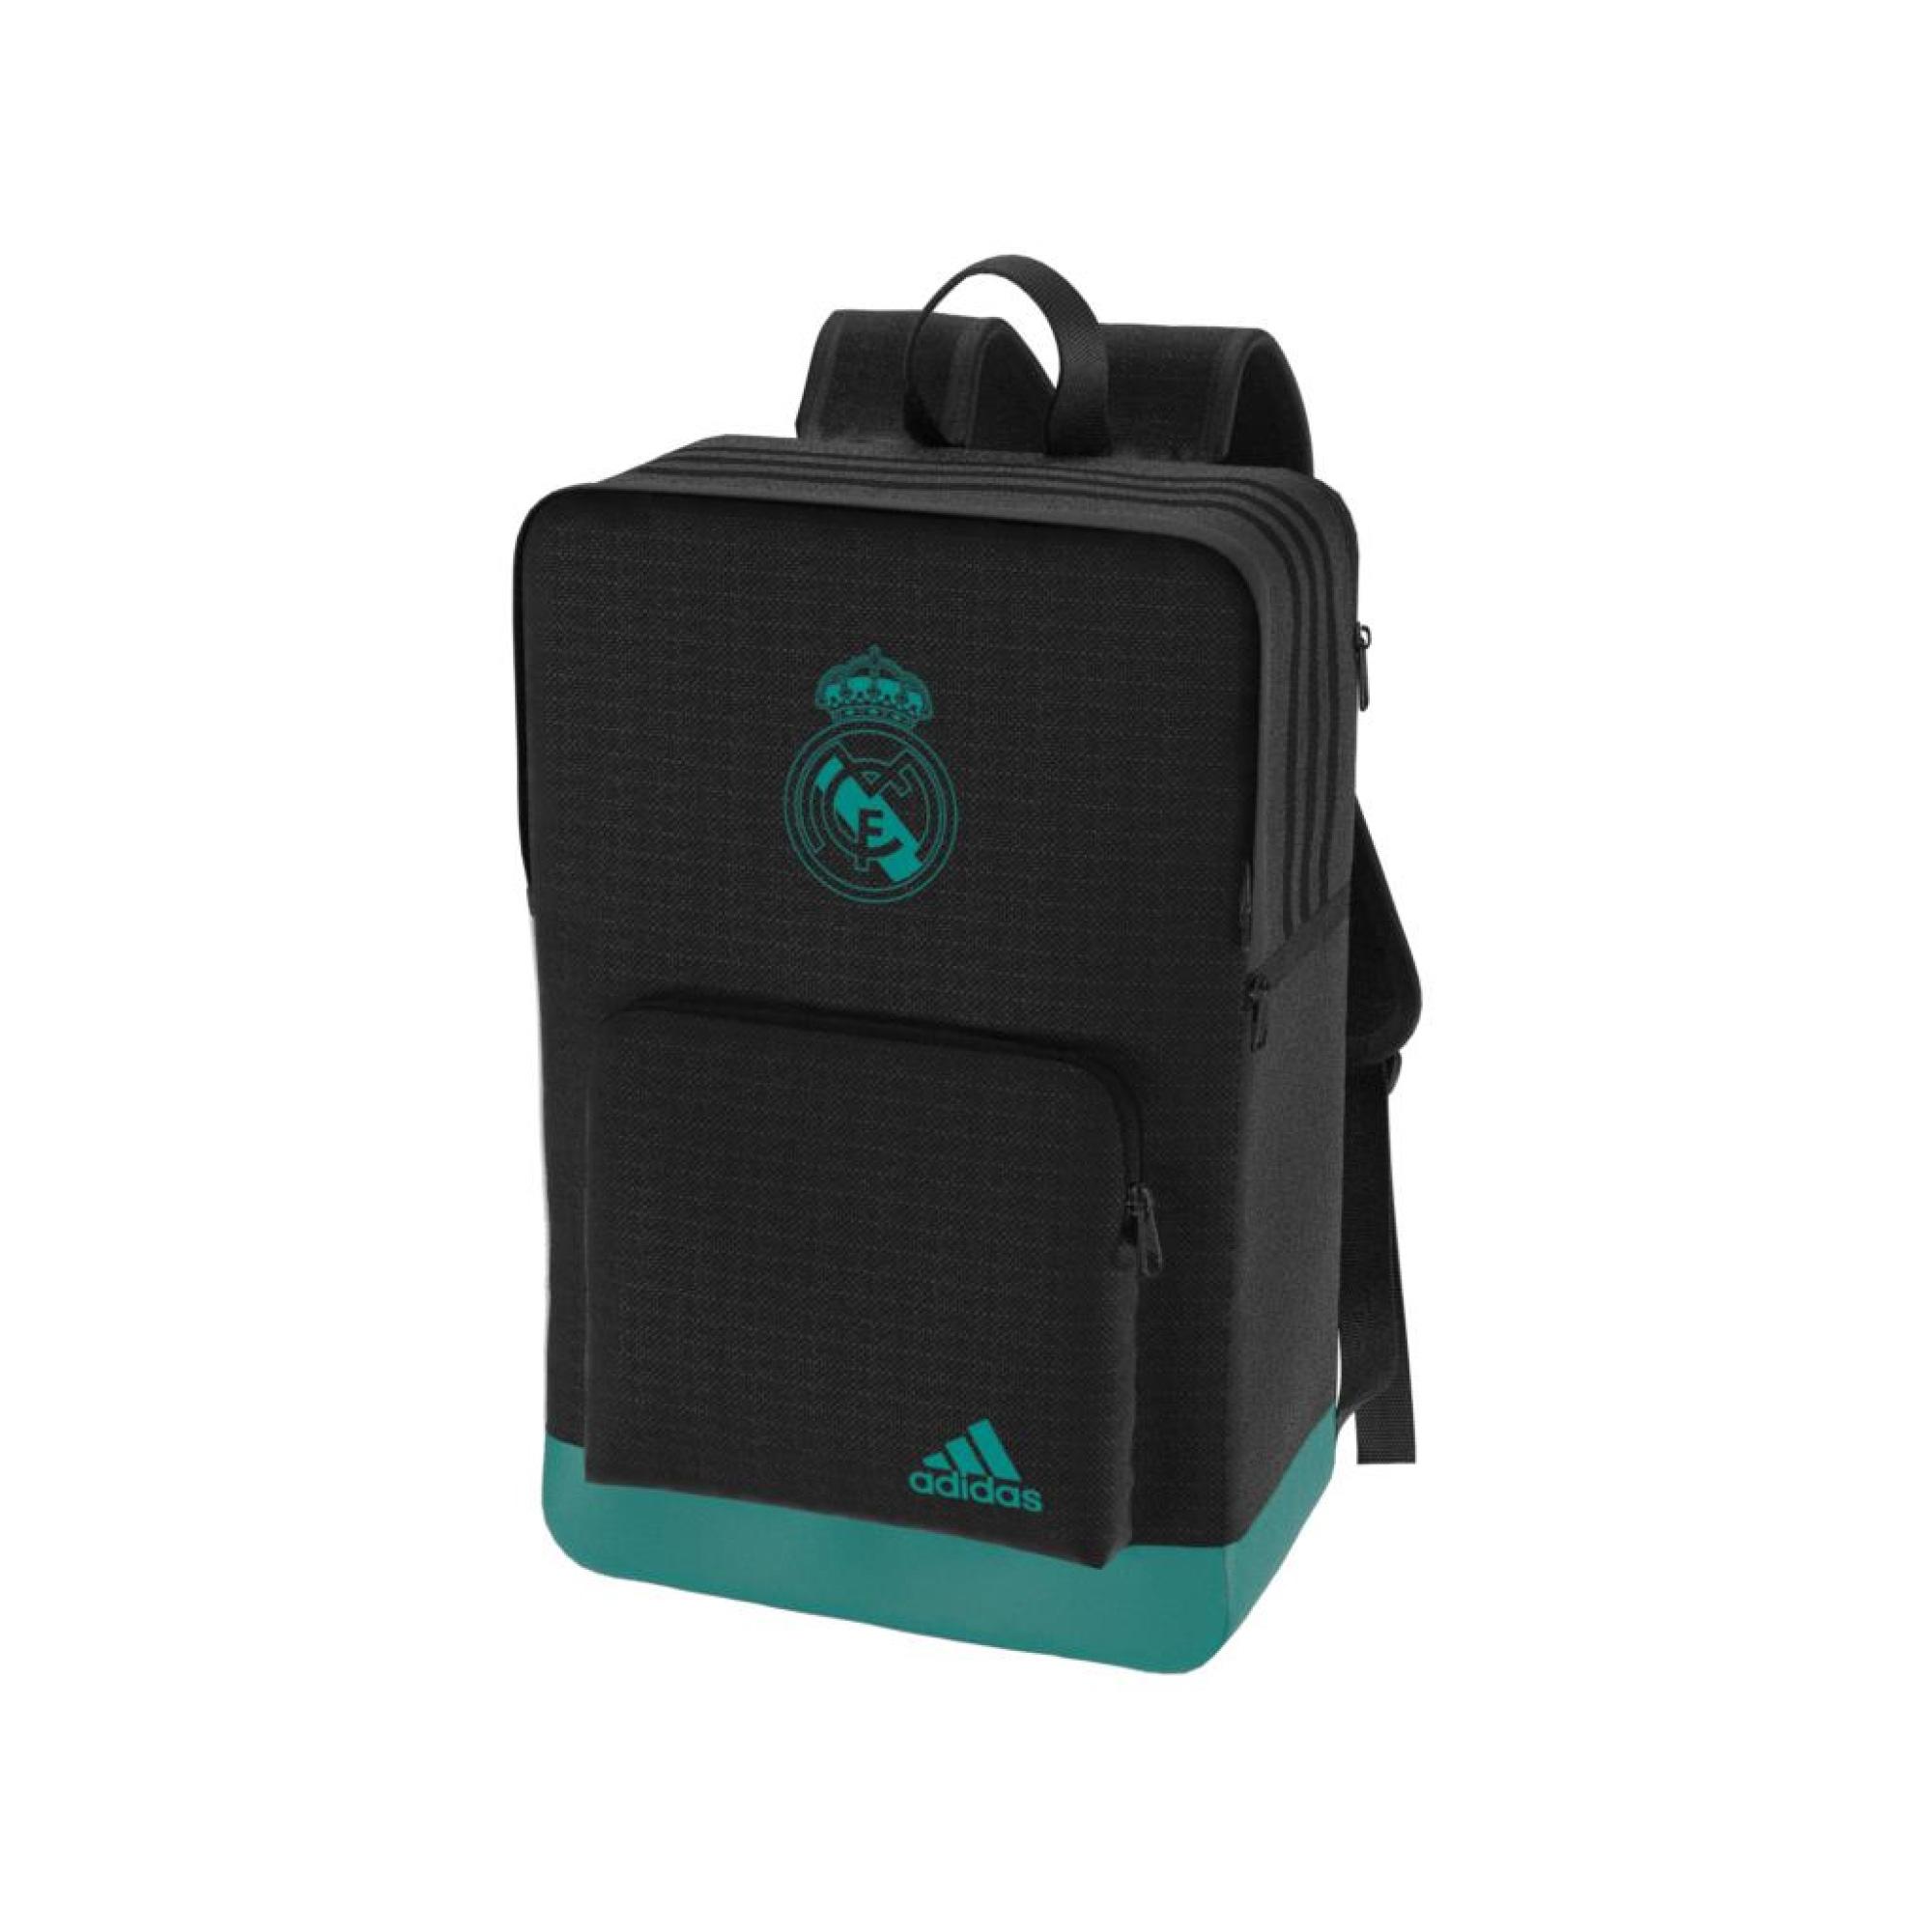 Madrid À Real Bayern Sac Dos Adidas Performance Backpack 2WH9YeEbDI